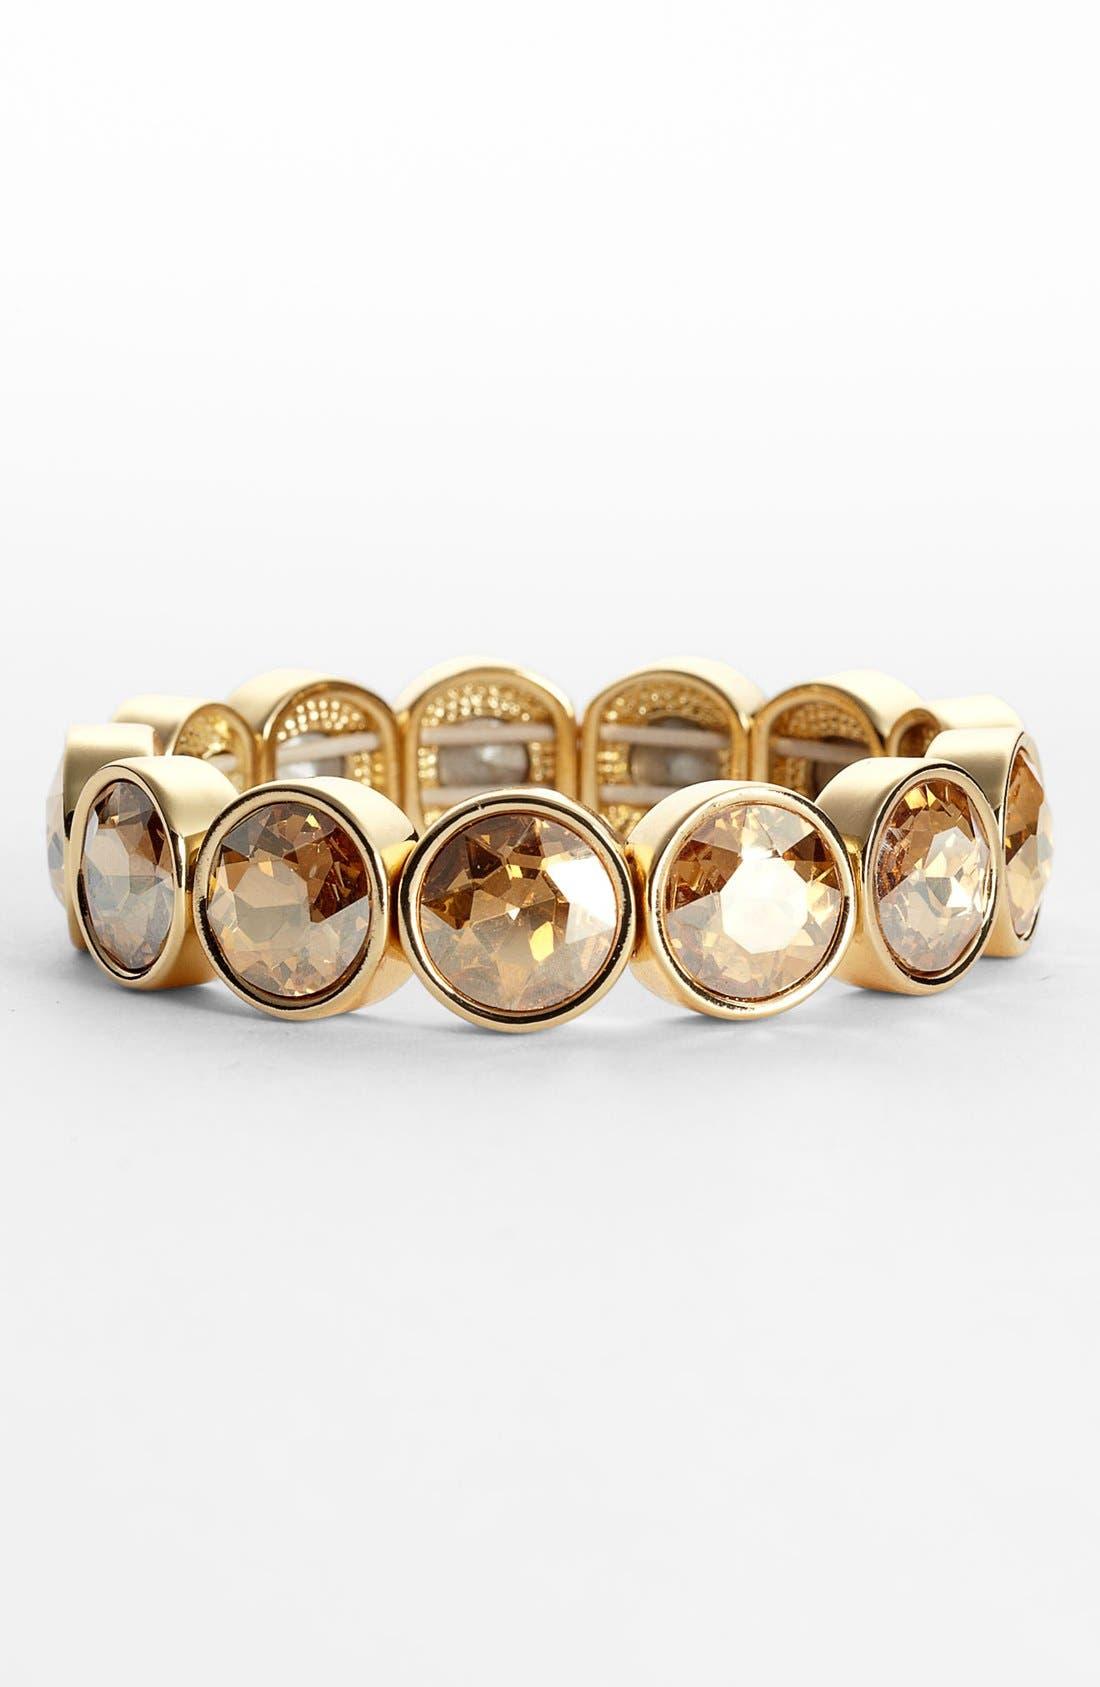 Main Image - Lydell NYC Crystal Stretch Bracelet